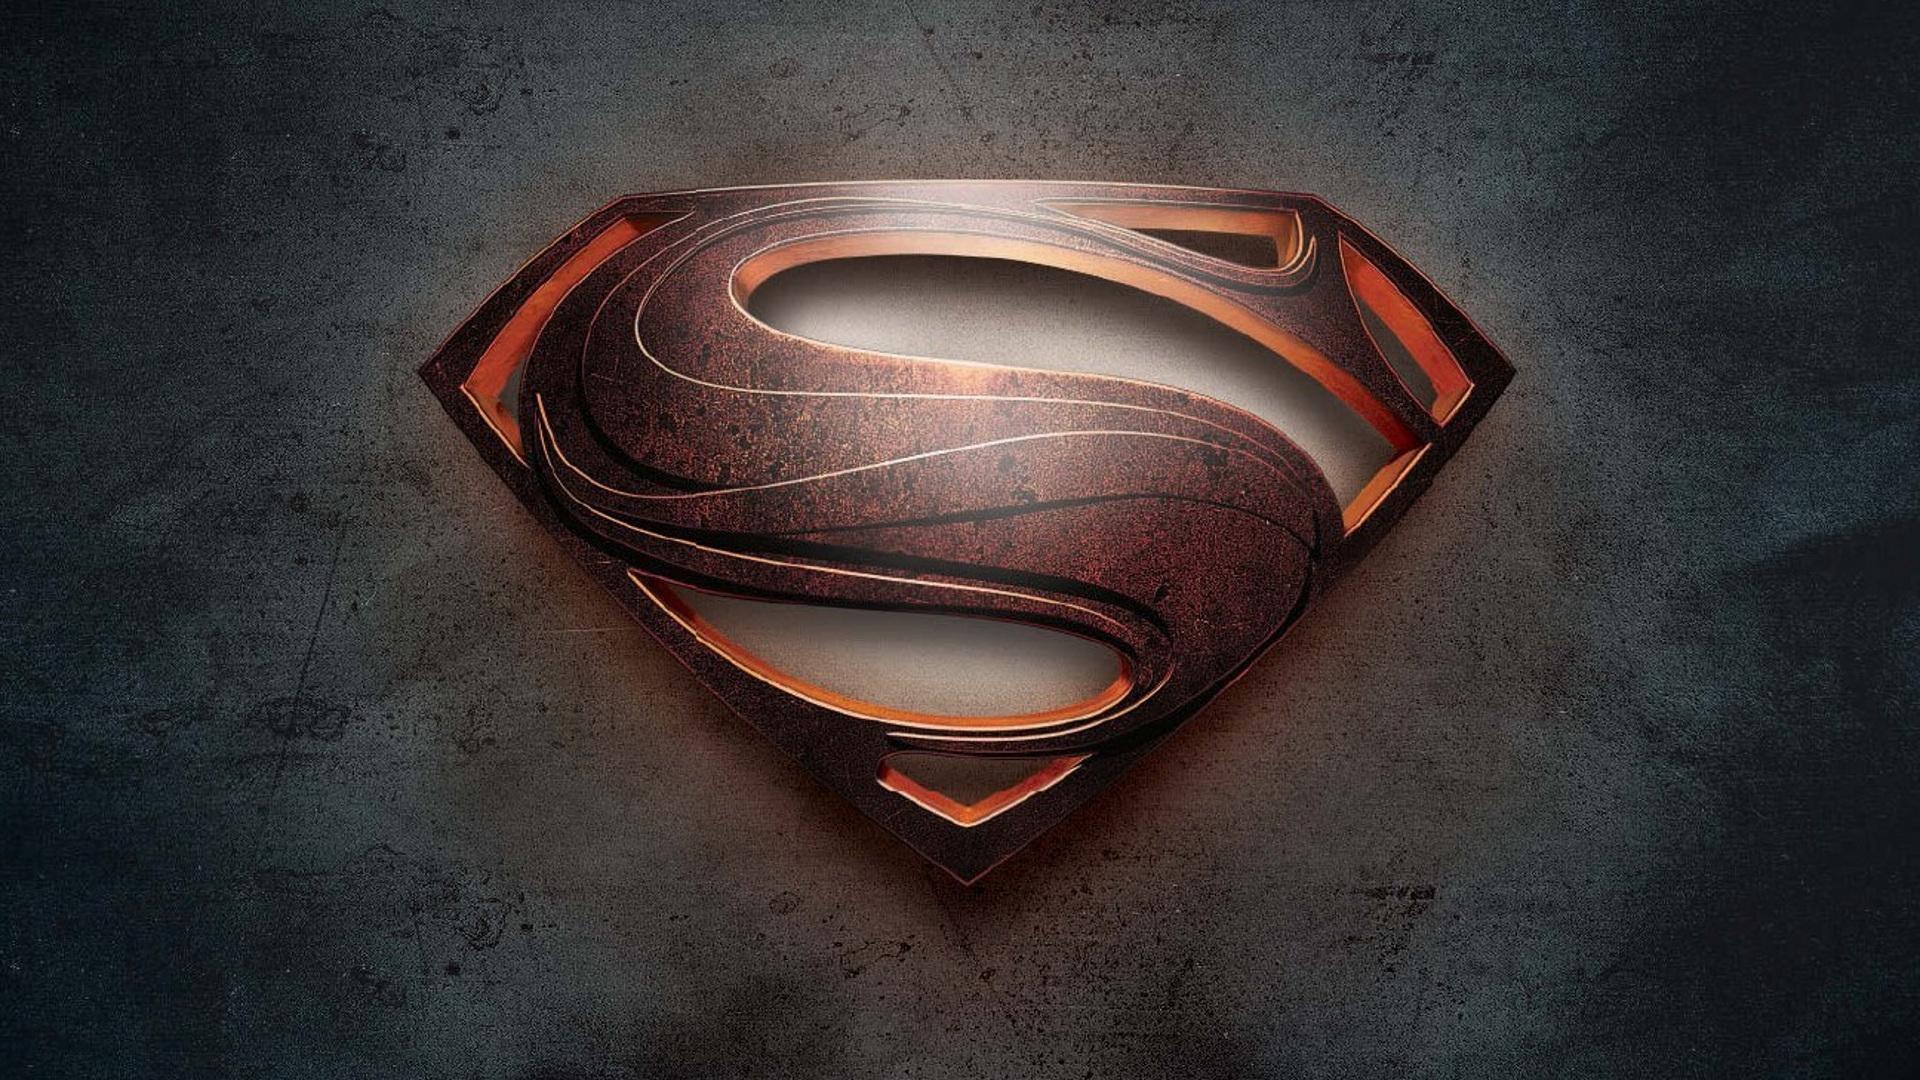 man of steel superman wallpapers | hd wallpapers | id #12019